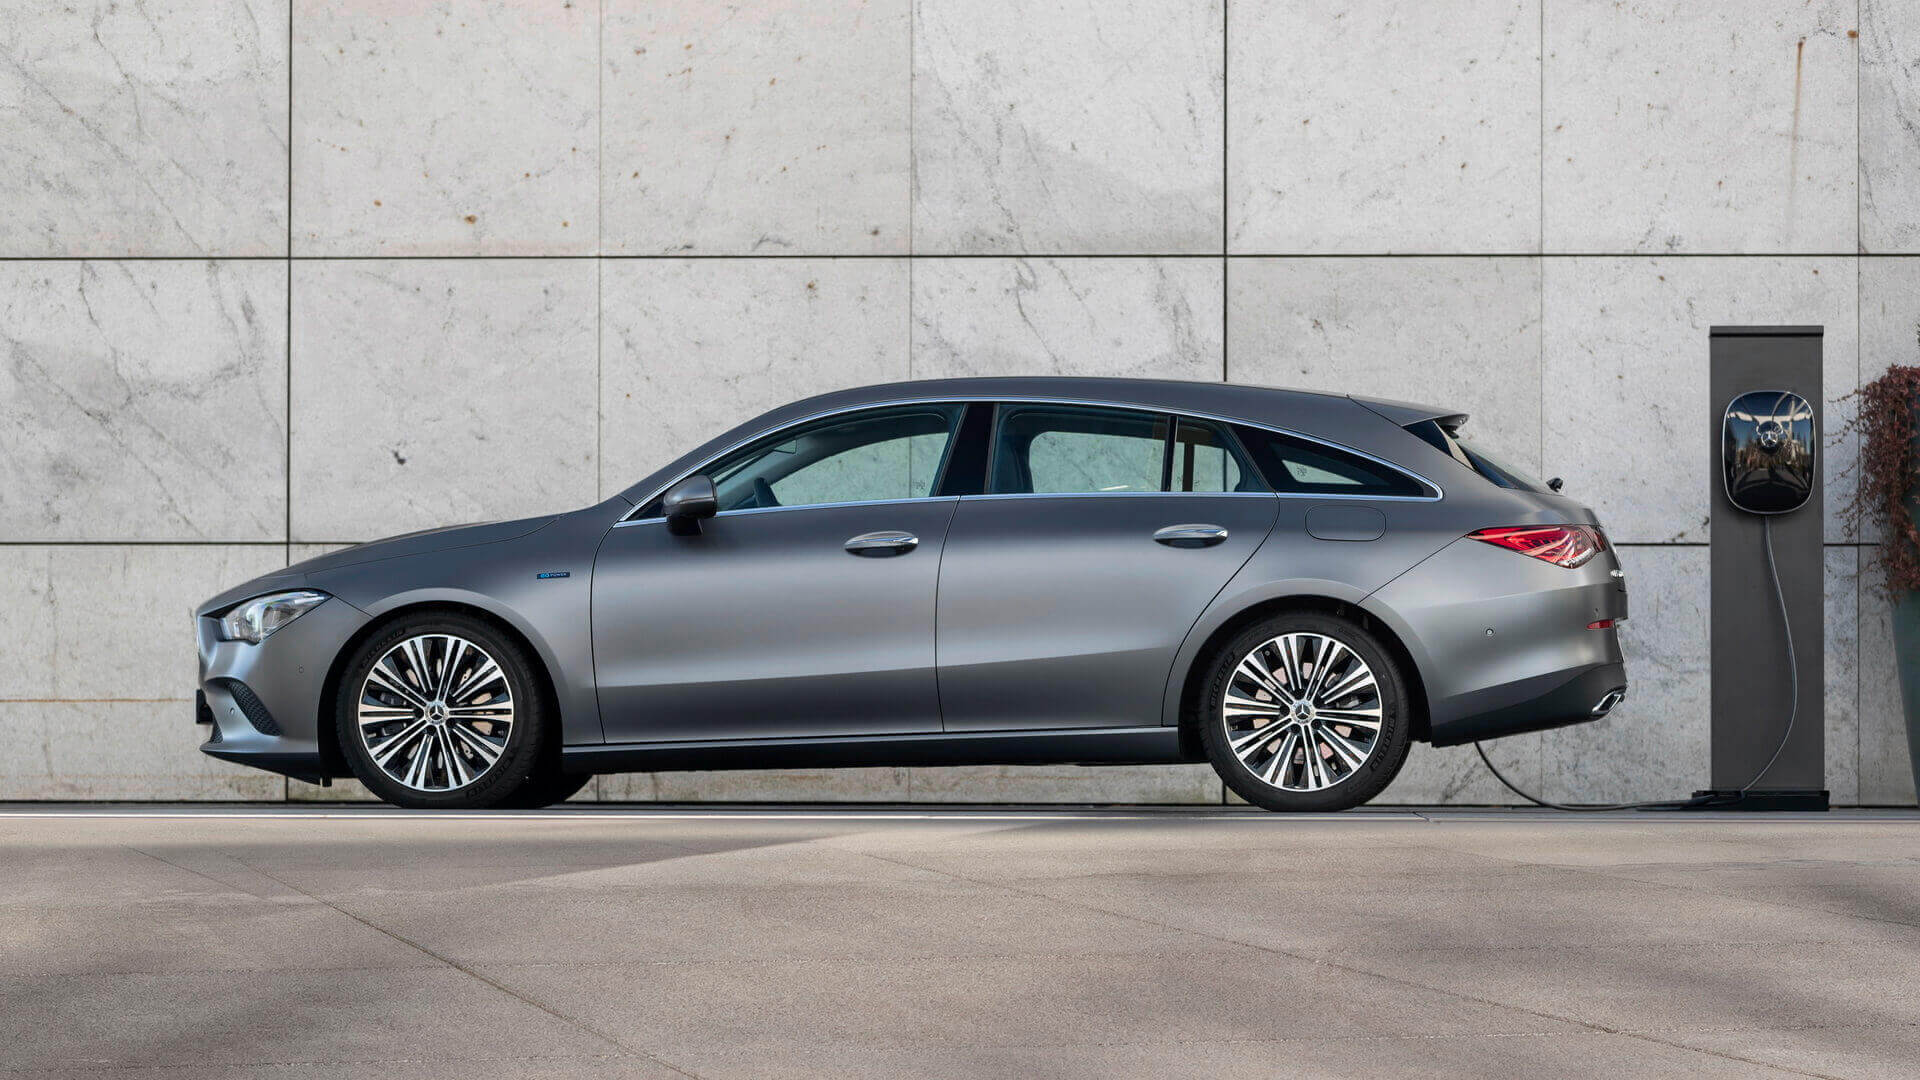 Плагин-гибрид Mercedes-Benz CLA 250 e Shooting Brake